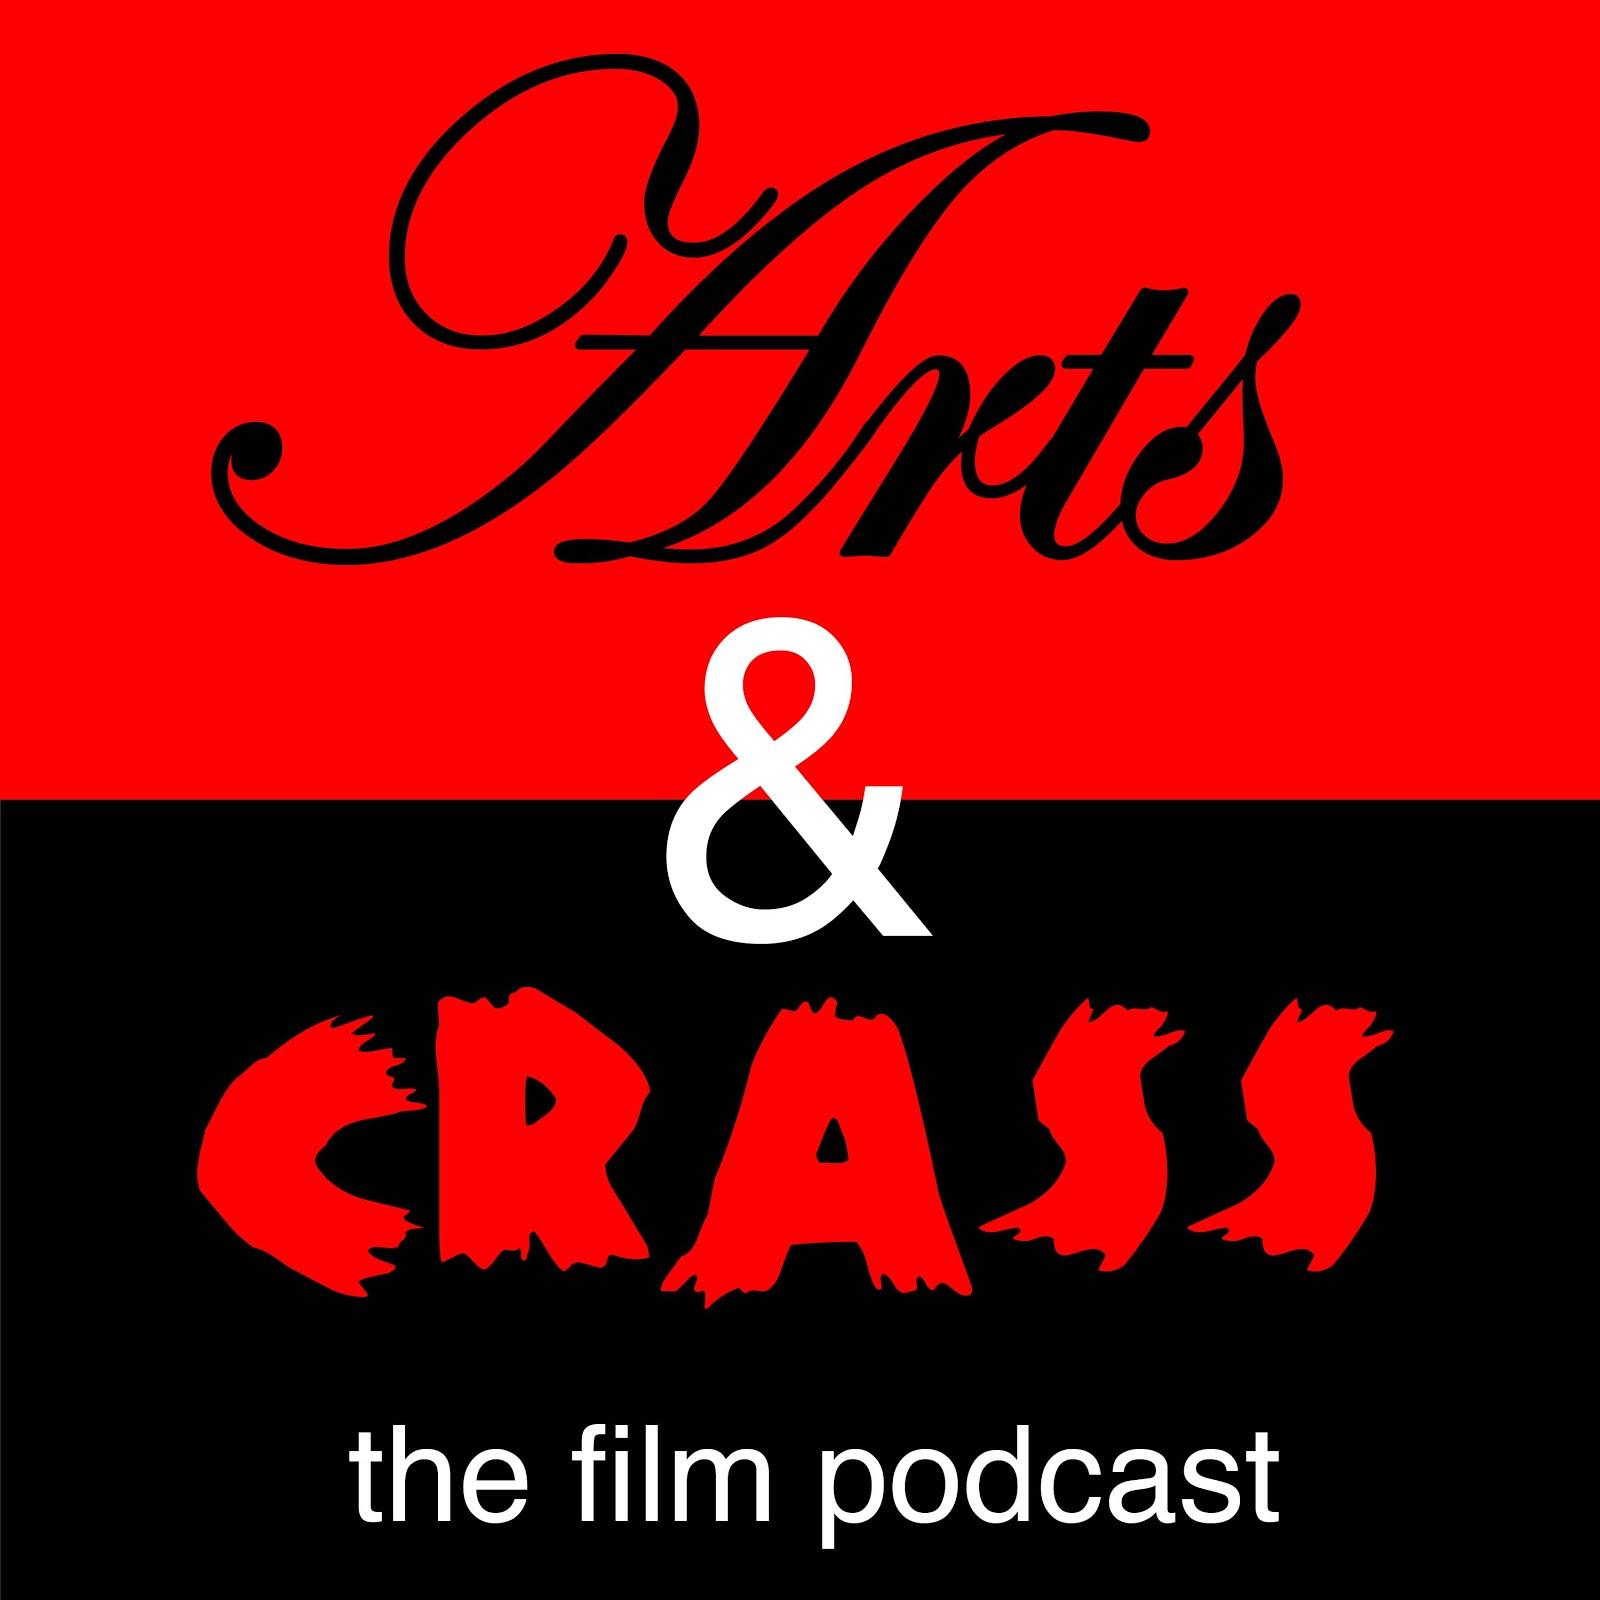 Arts & Crass: The Highbrow Lowbrow Film Podcast